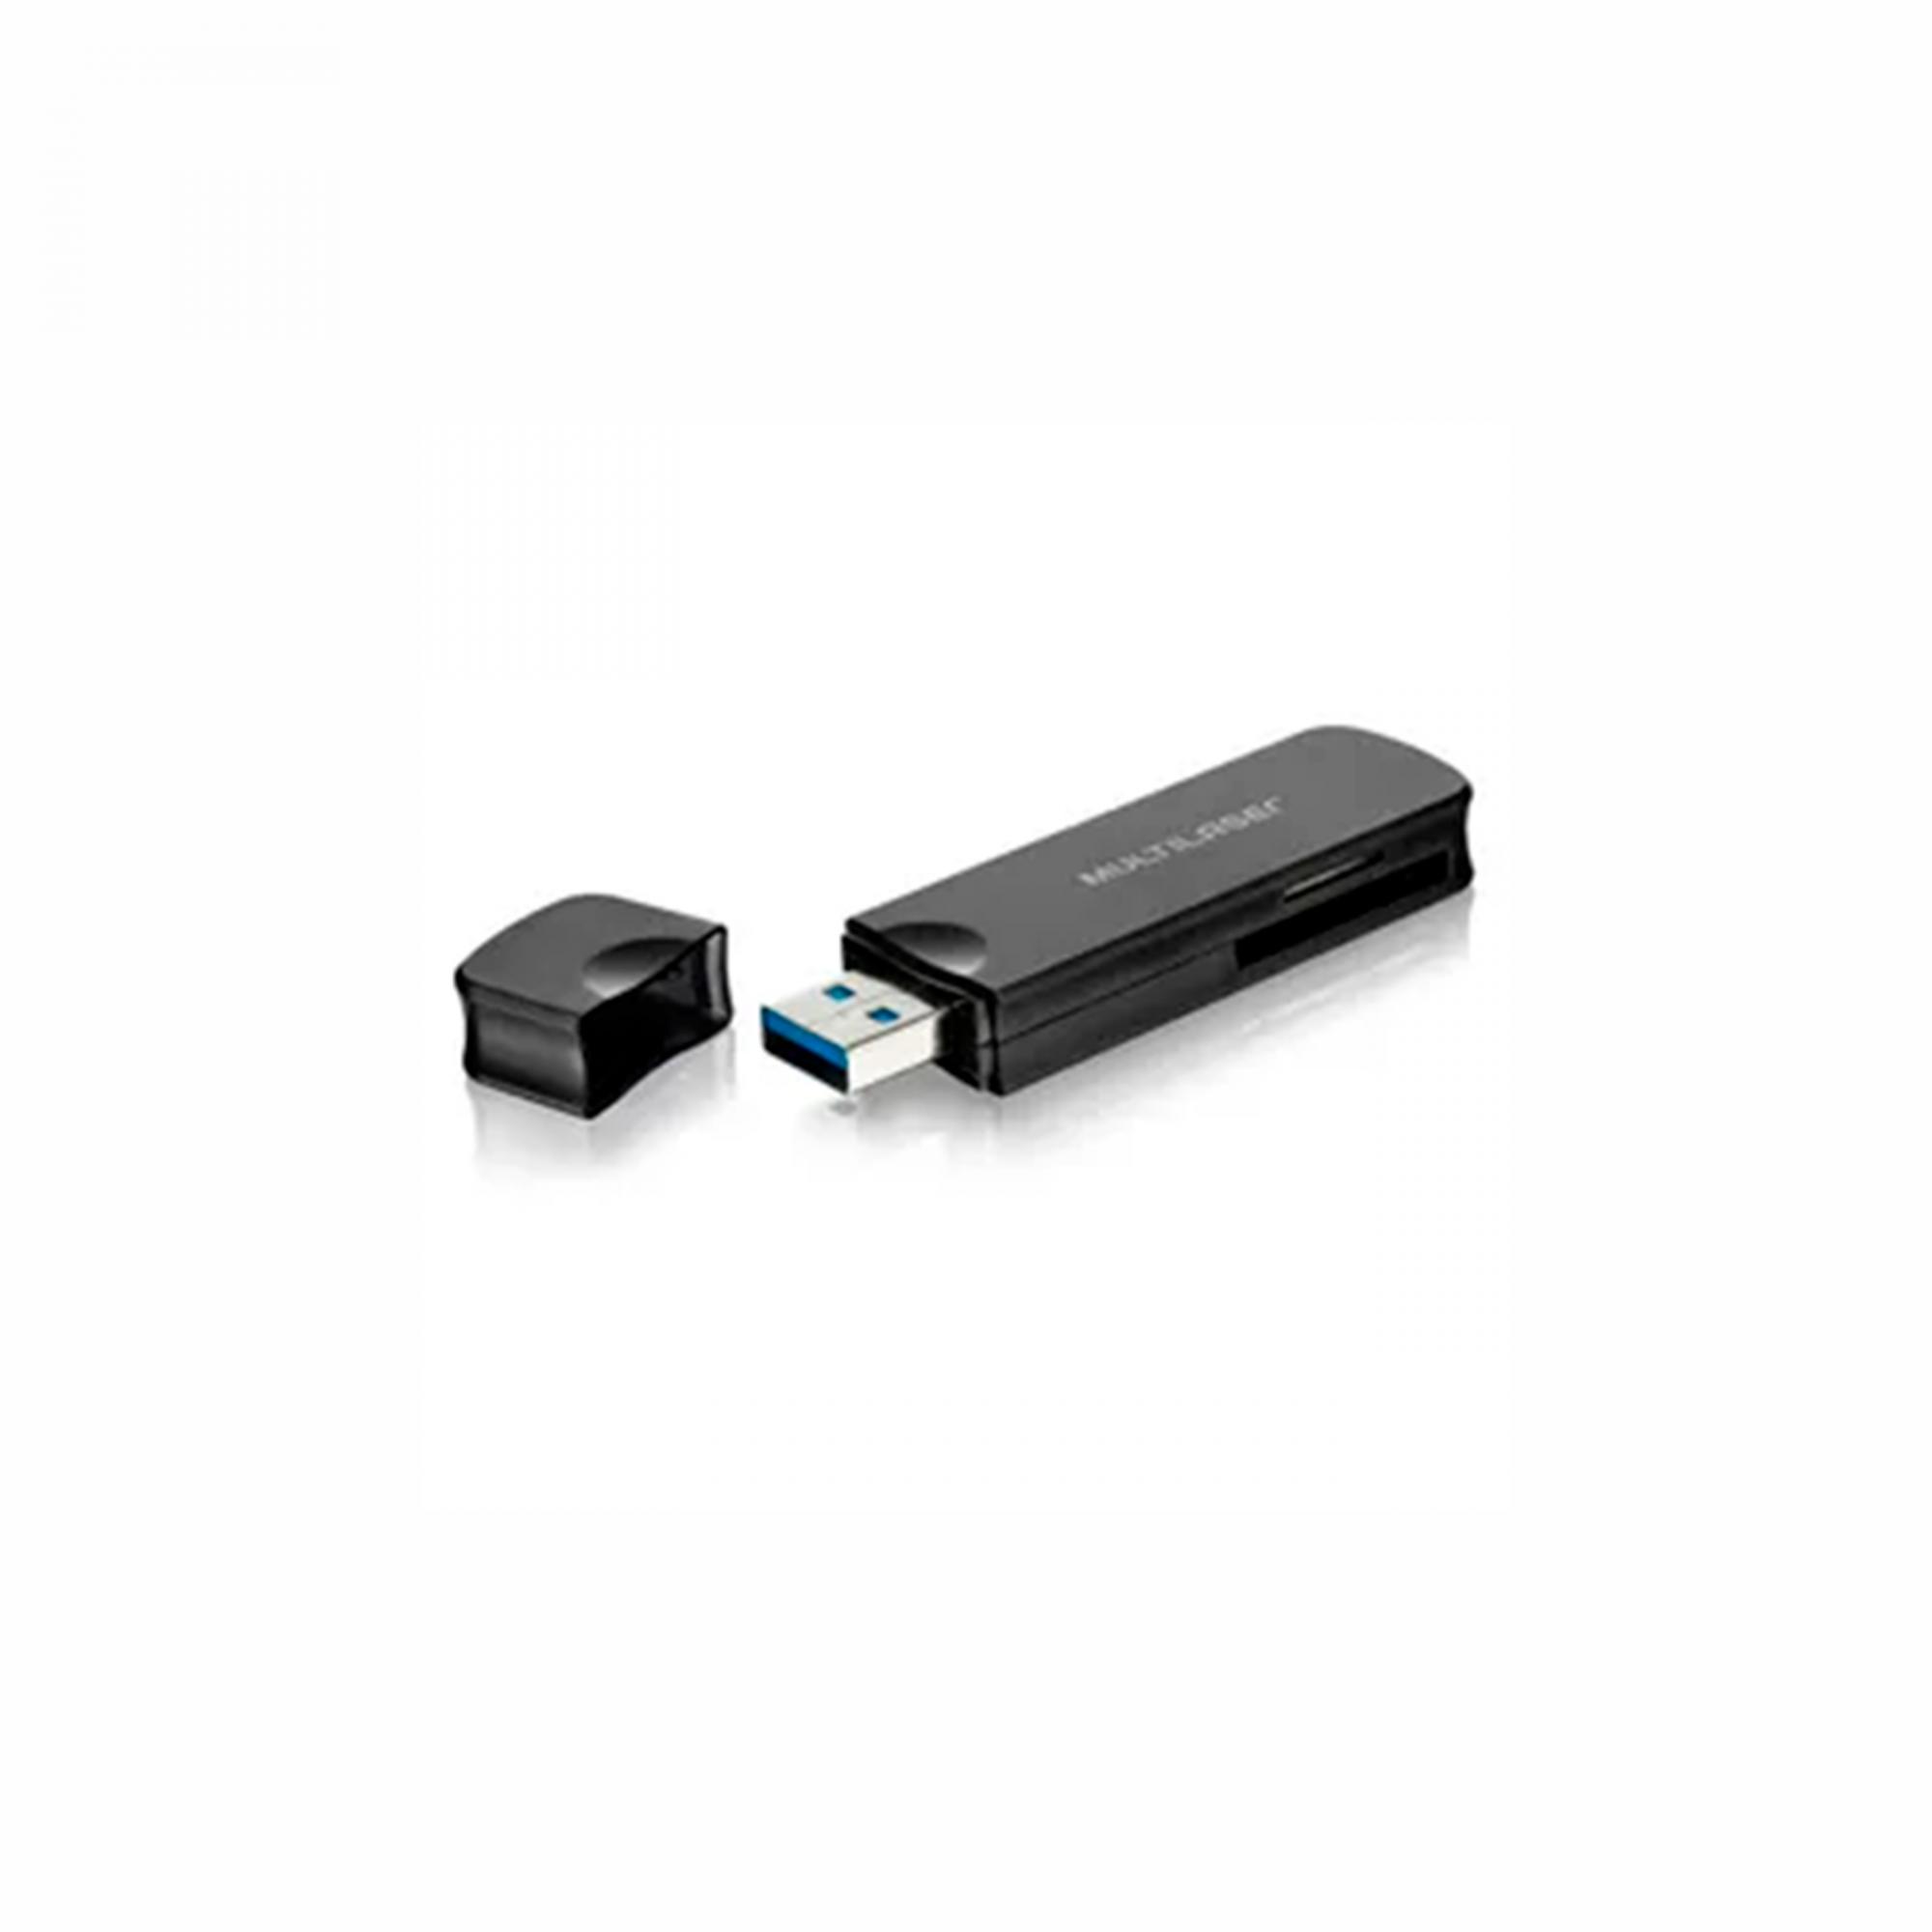 LEITOR CARTAO USB AC290 MULTILASER